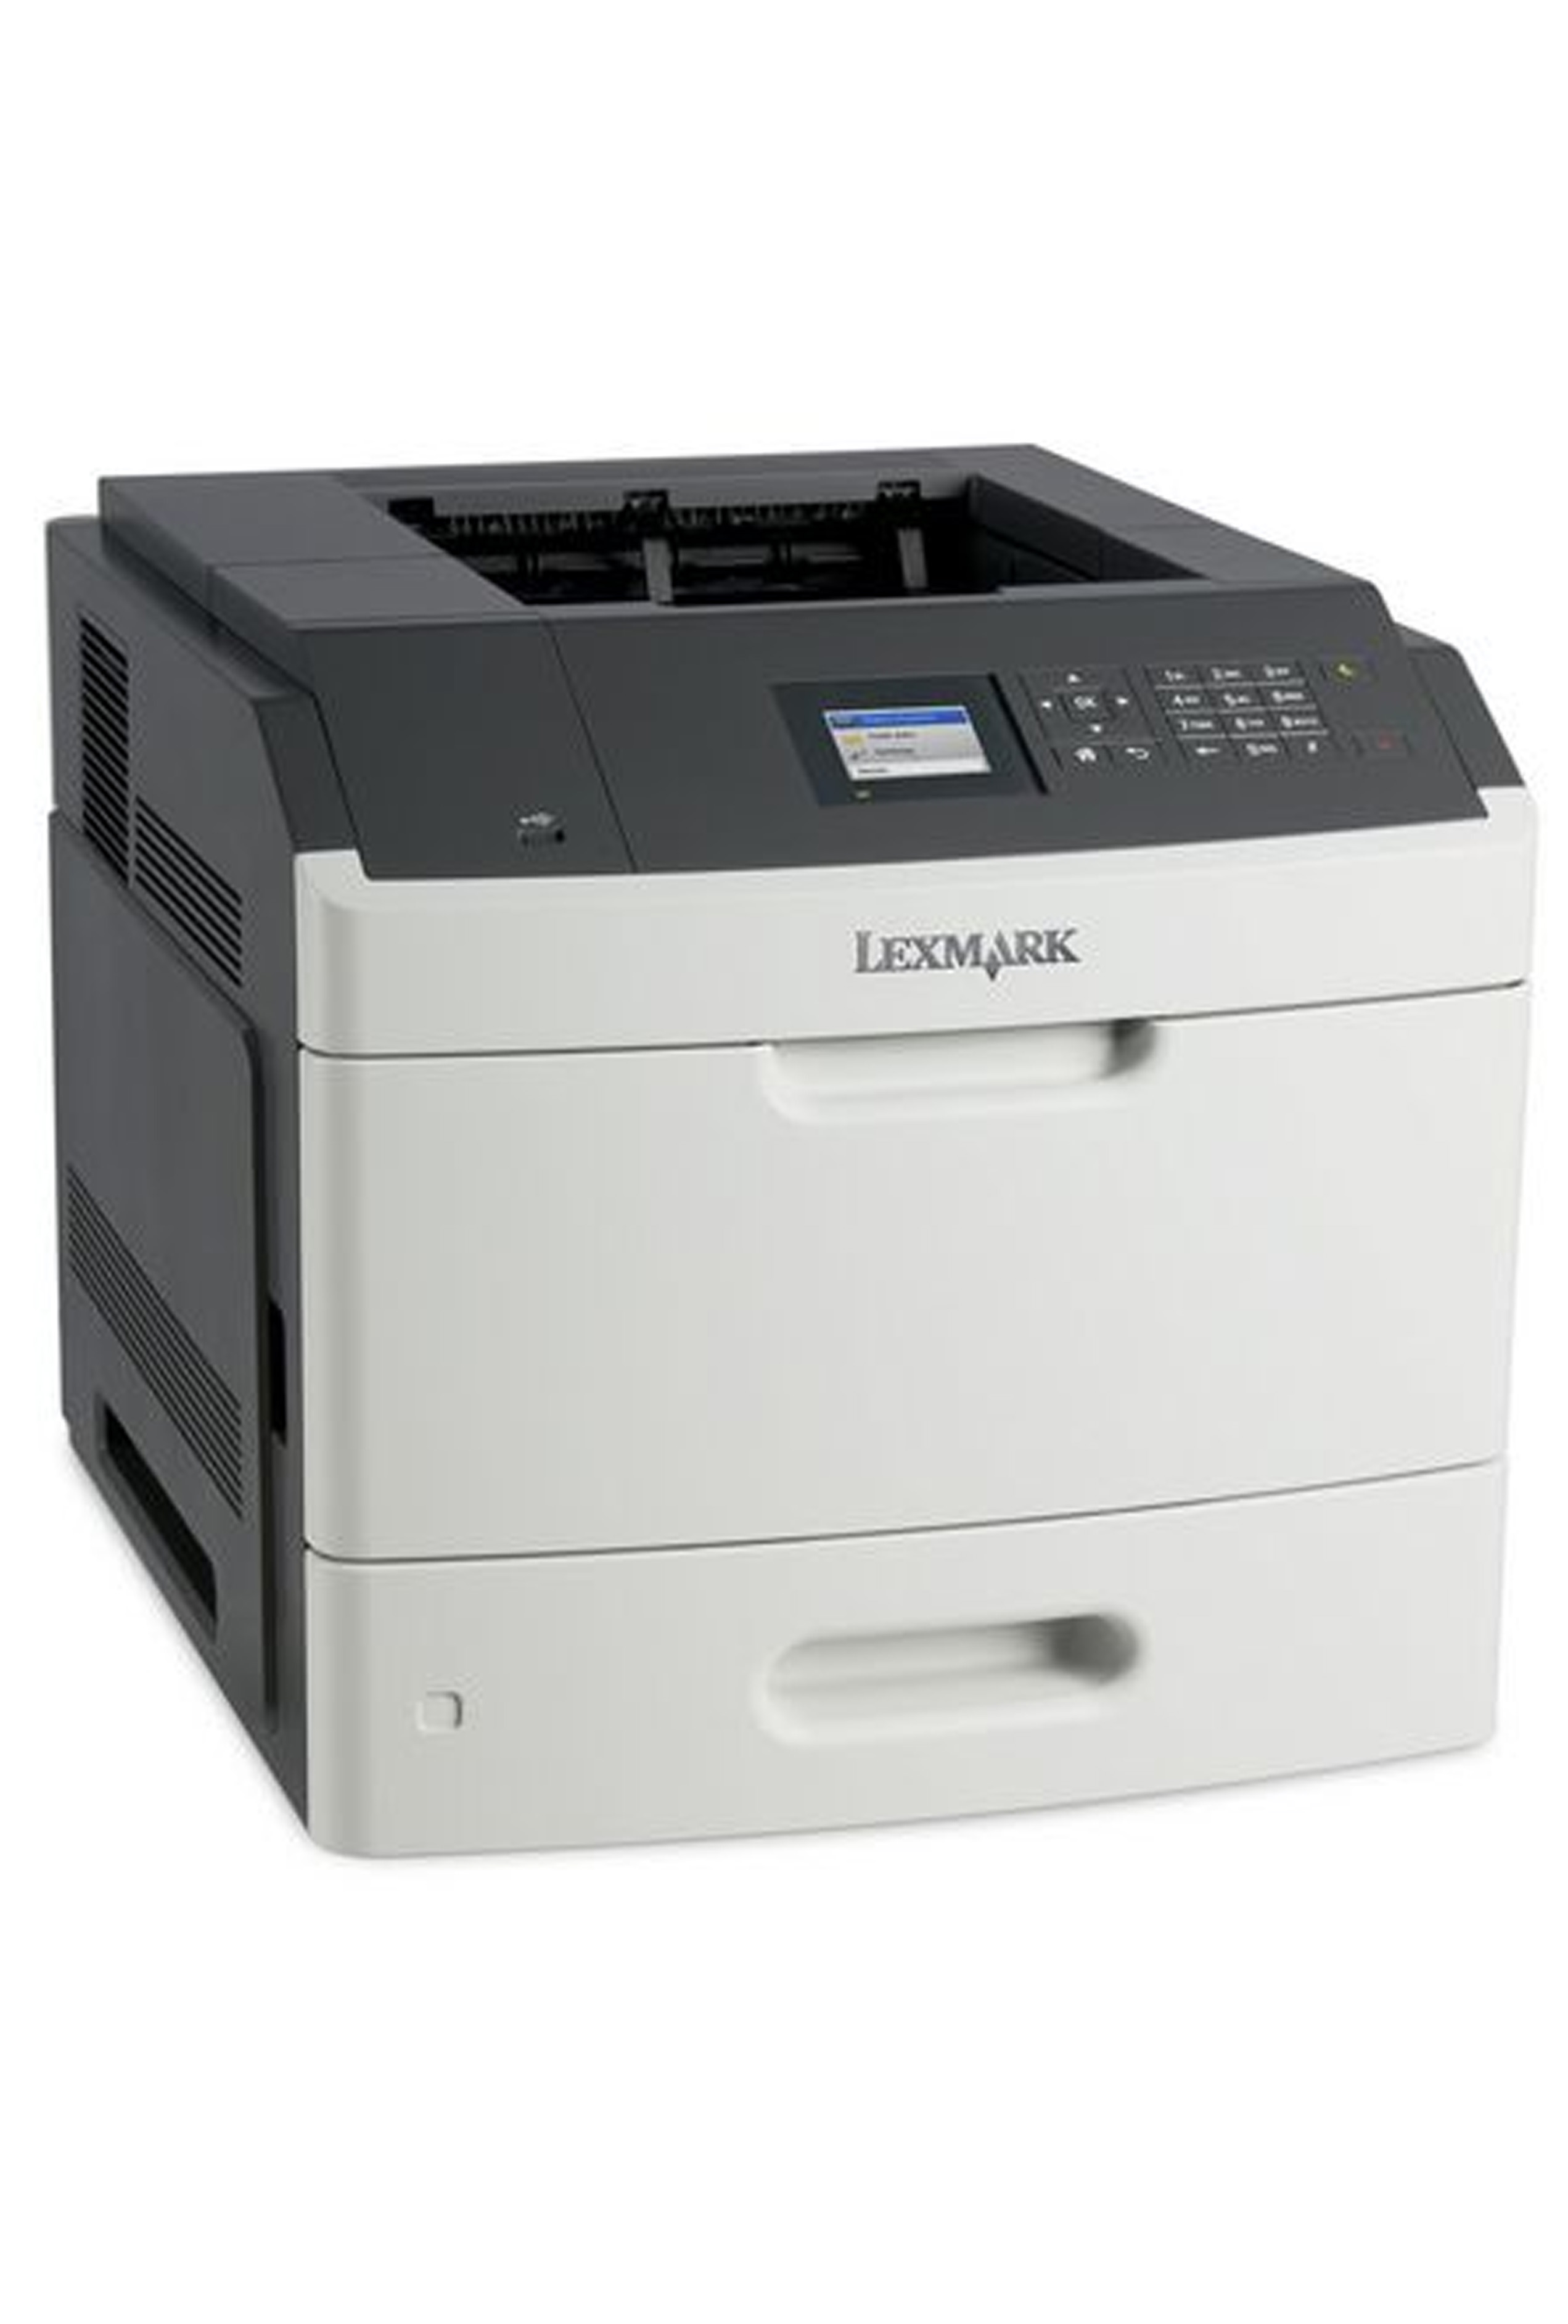 Lexmark MS811N Laser Printer...